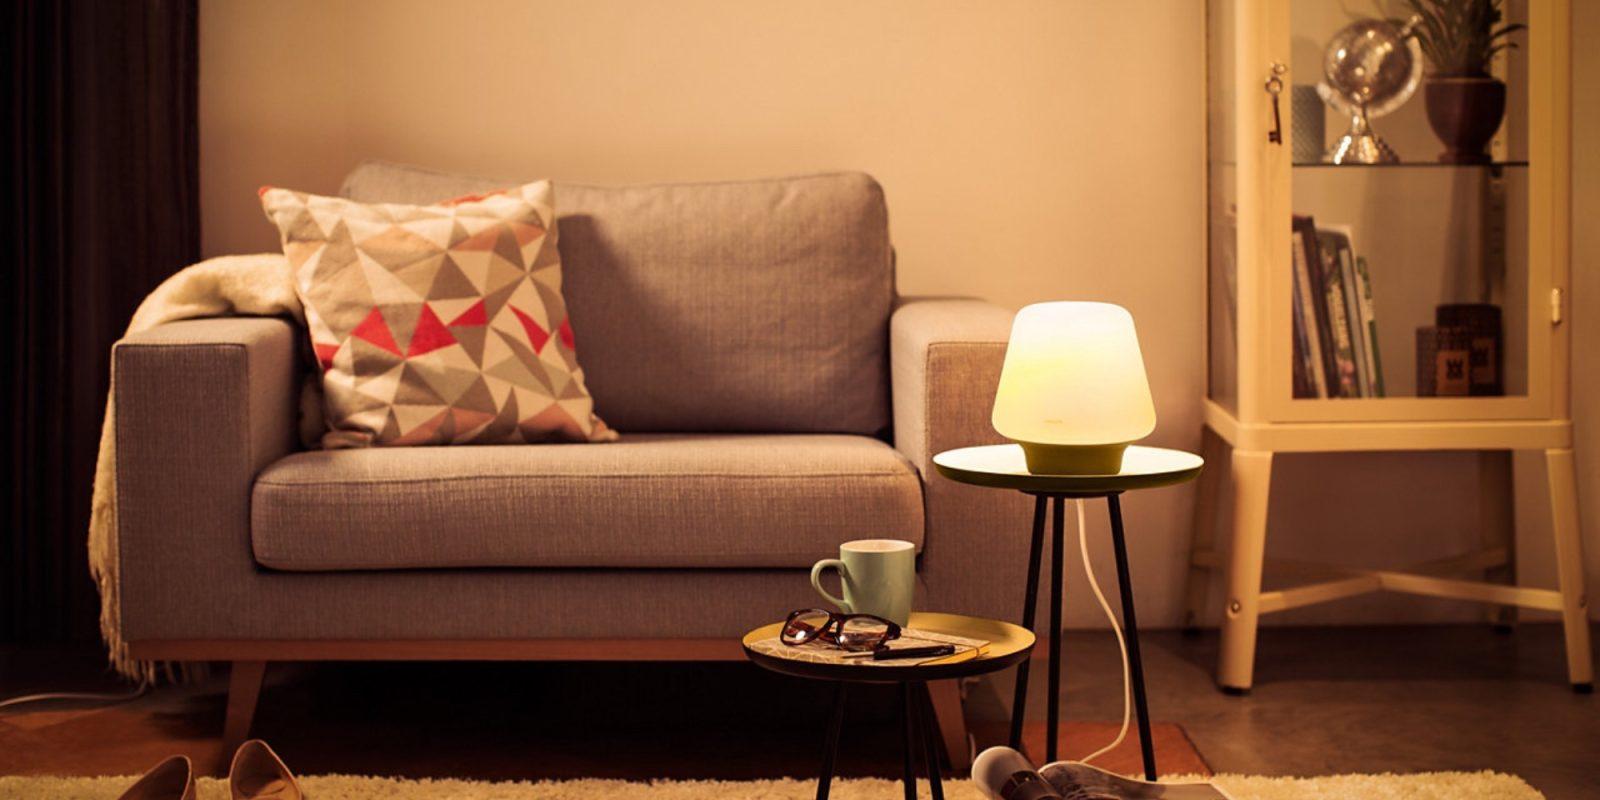 Flipboard Philips Hue Wellness Lamp Gets Rare Discount To